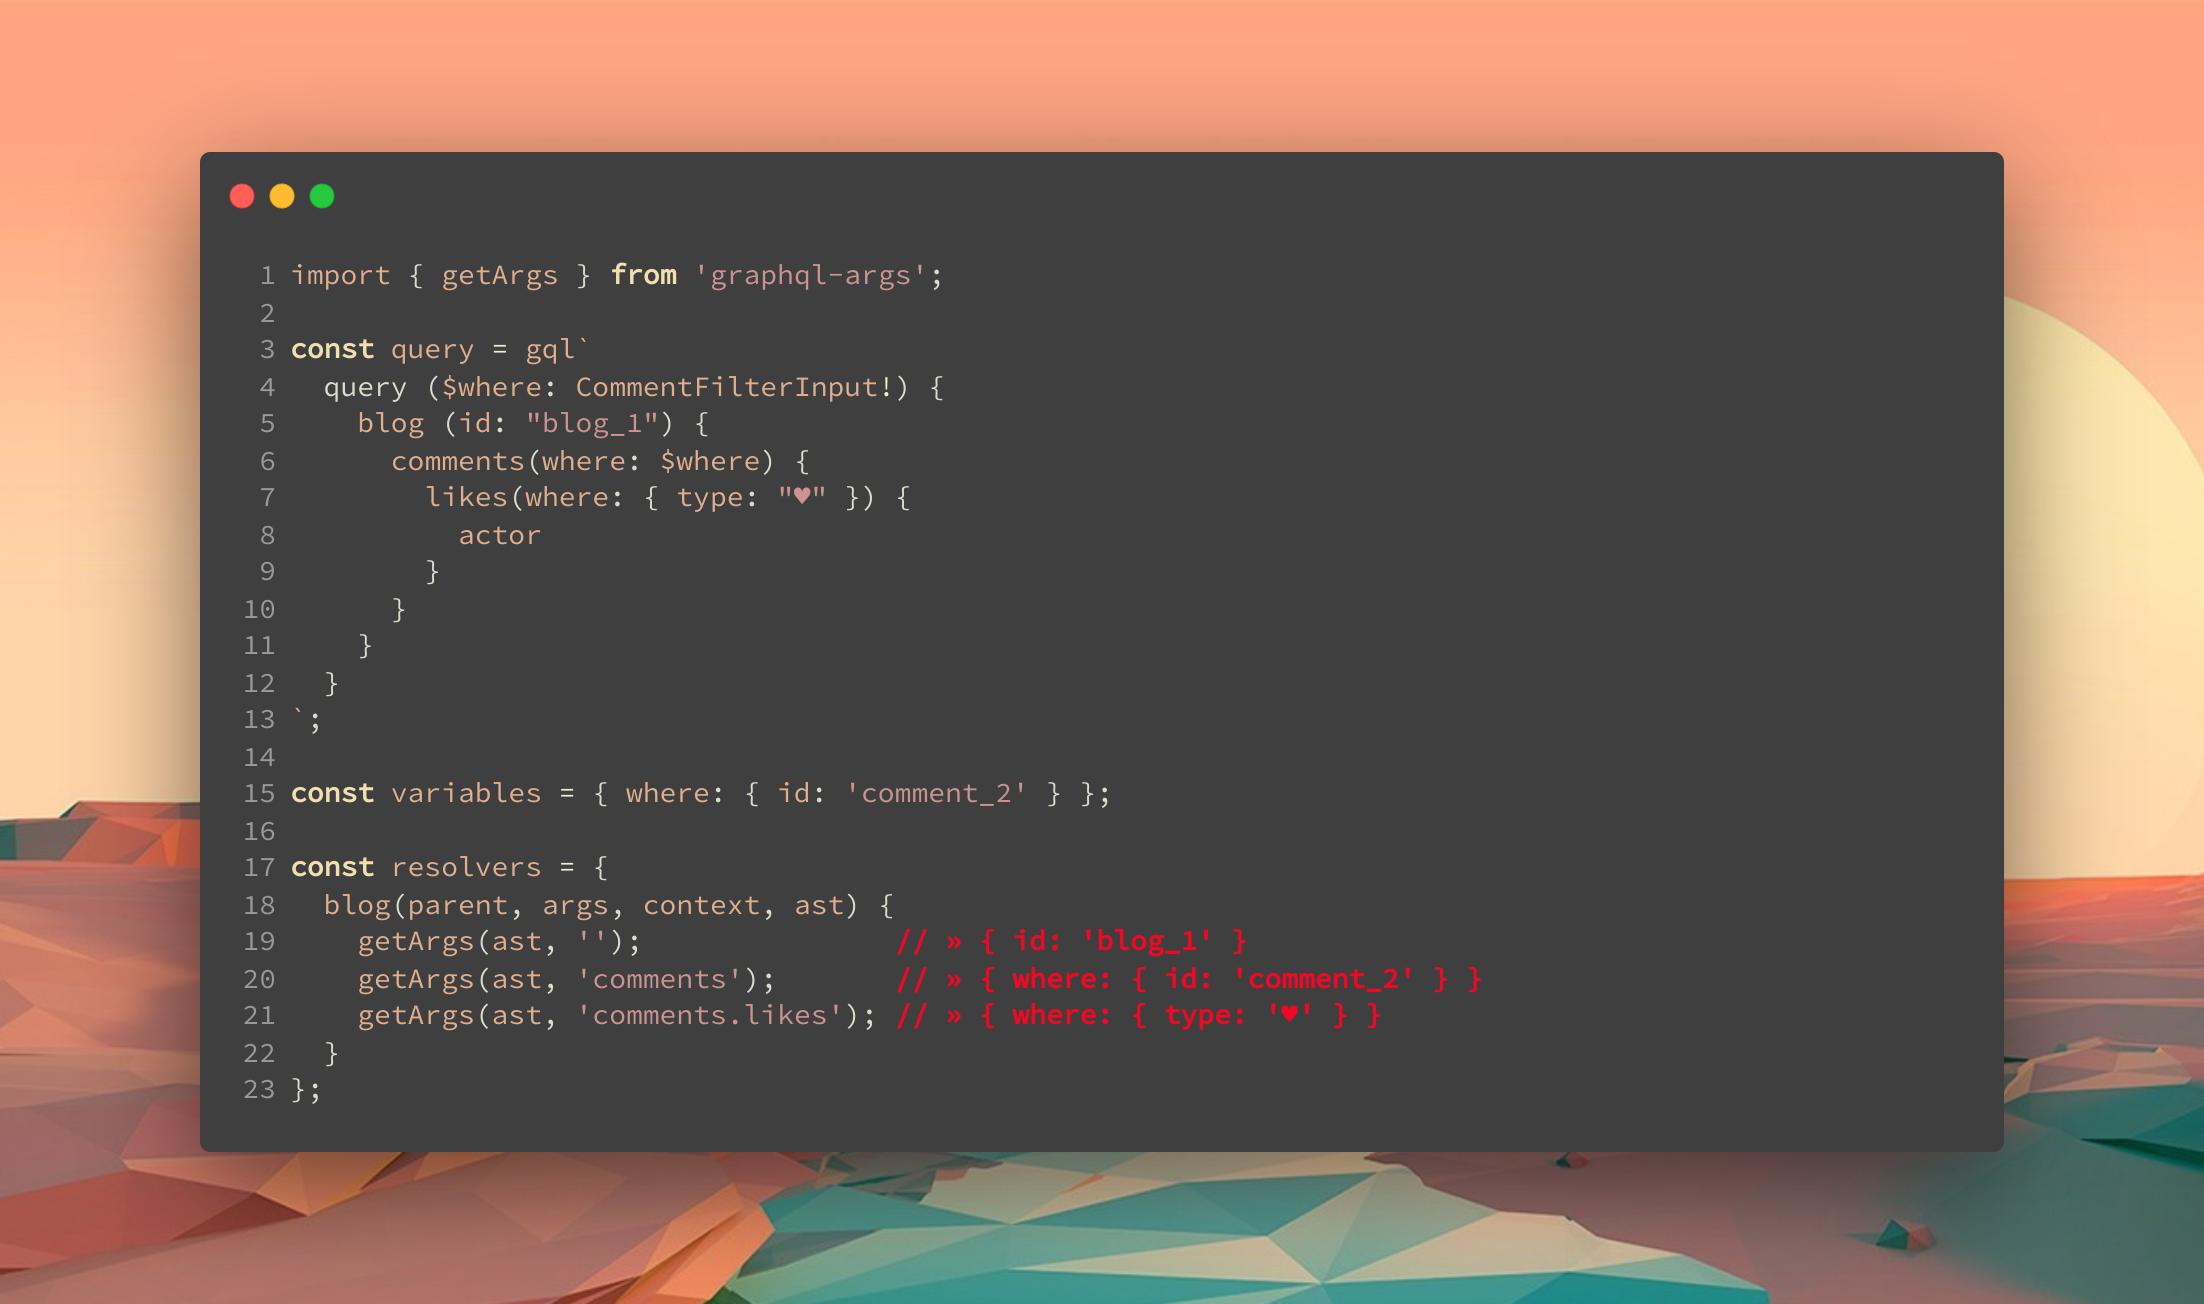 screenshot of getArgs output